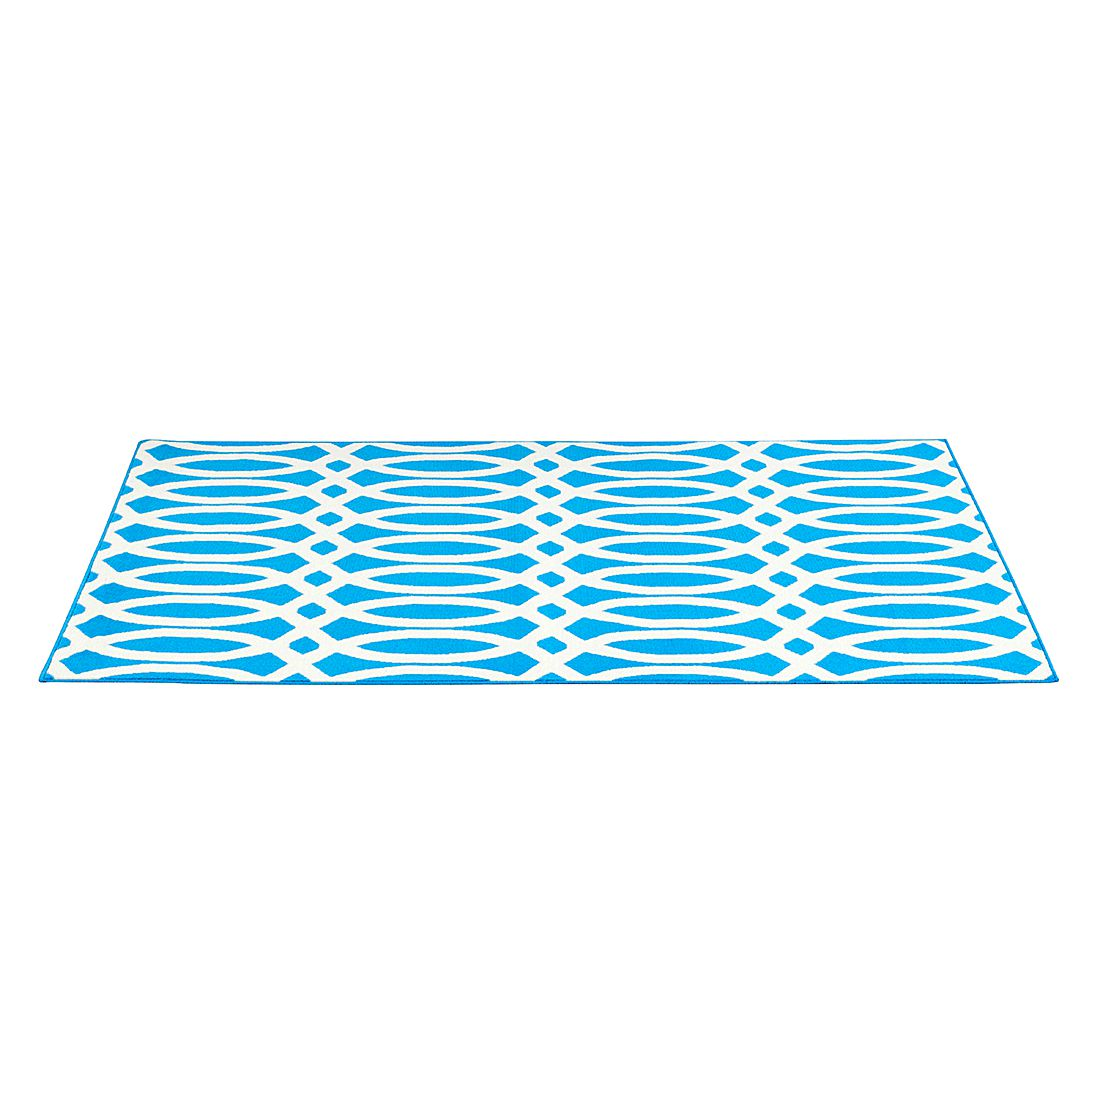 Teppich Mixed – Blau – 200 x 290 cm, Hanse Home Collection bestellen